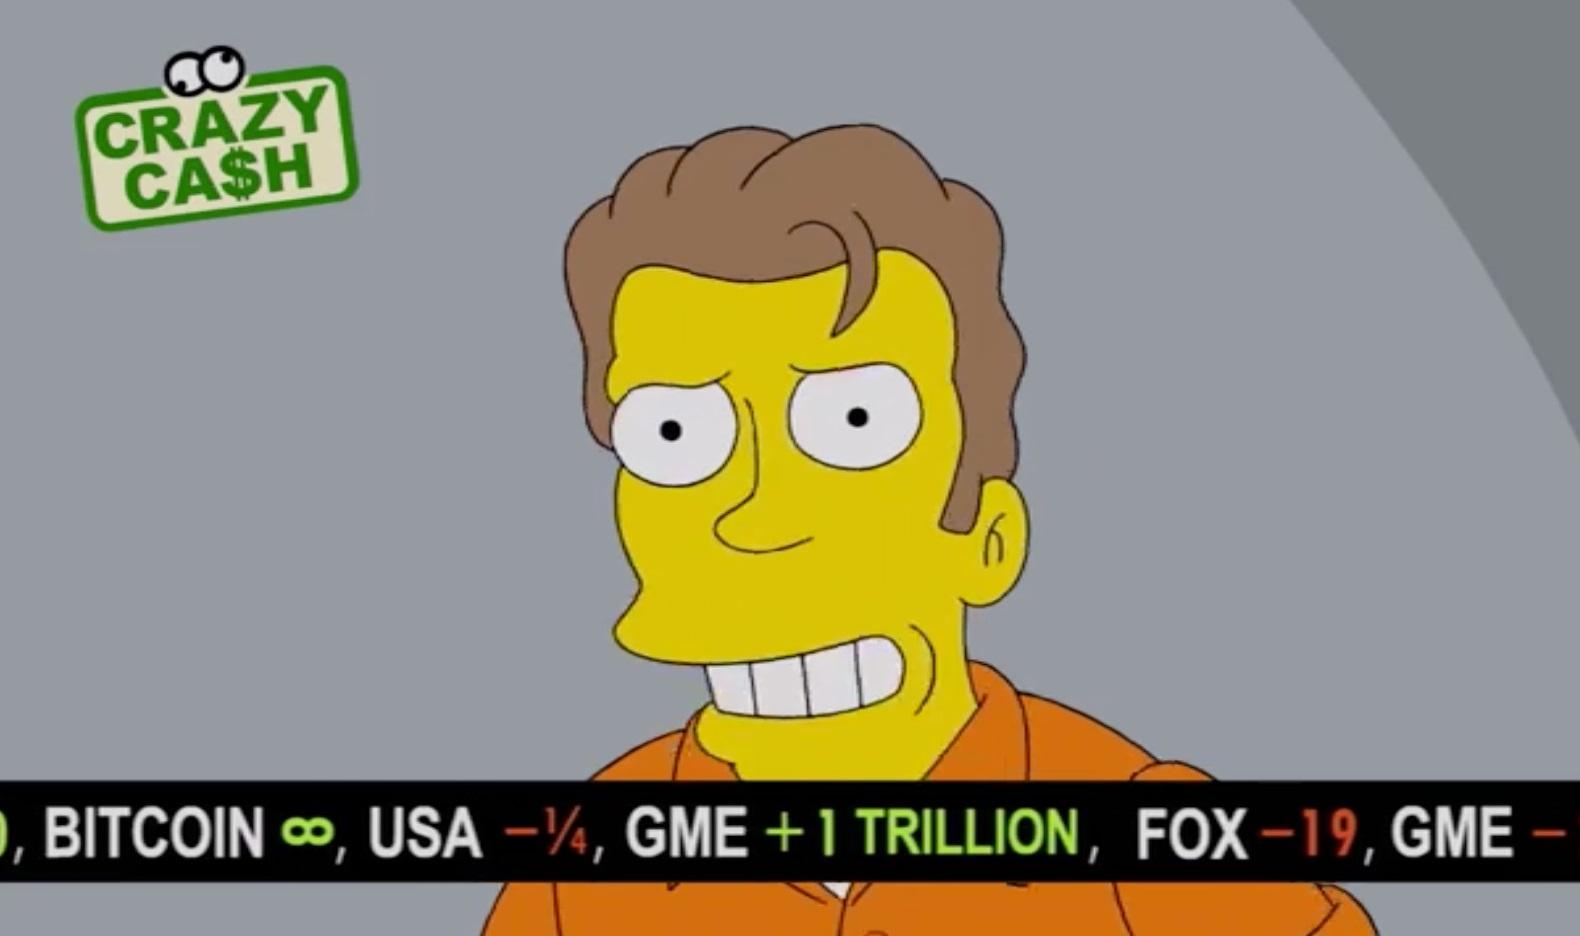 پیش بینی قیمت بیت کوین در کارتون سیمپسون ها